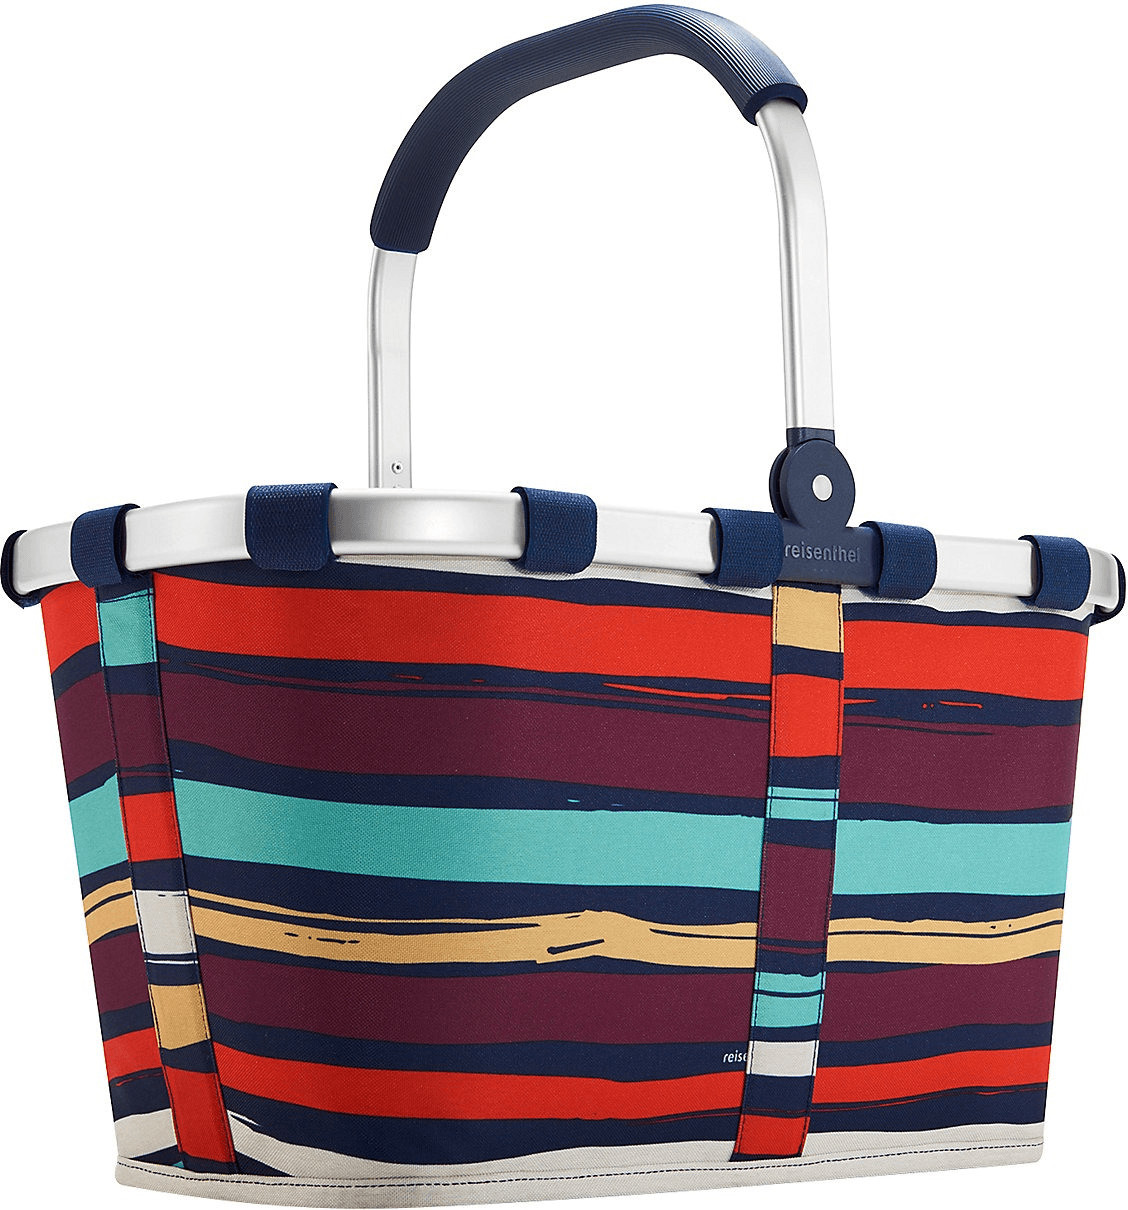 Reisenthel Carrybag artist stripes